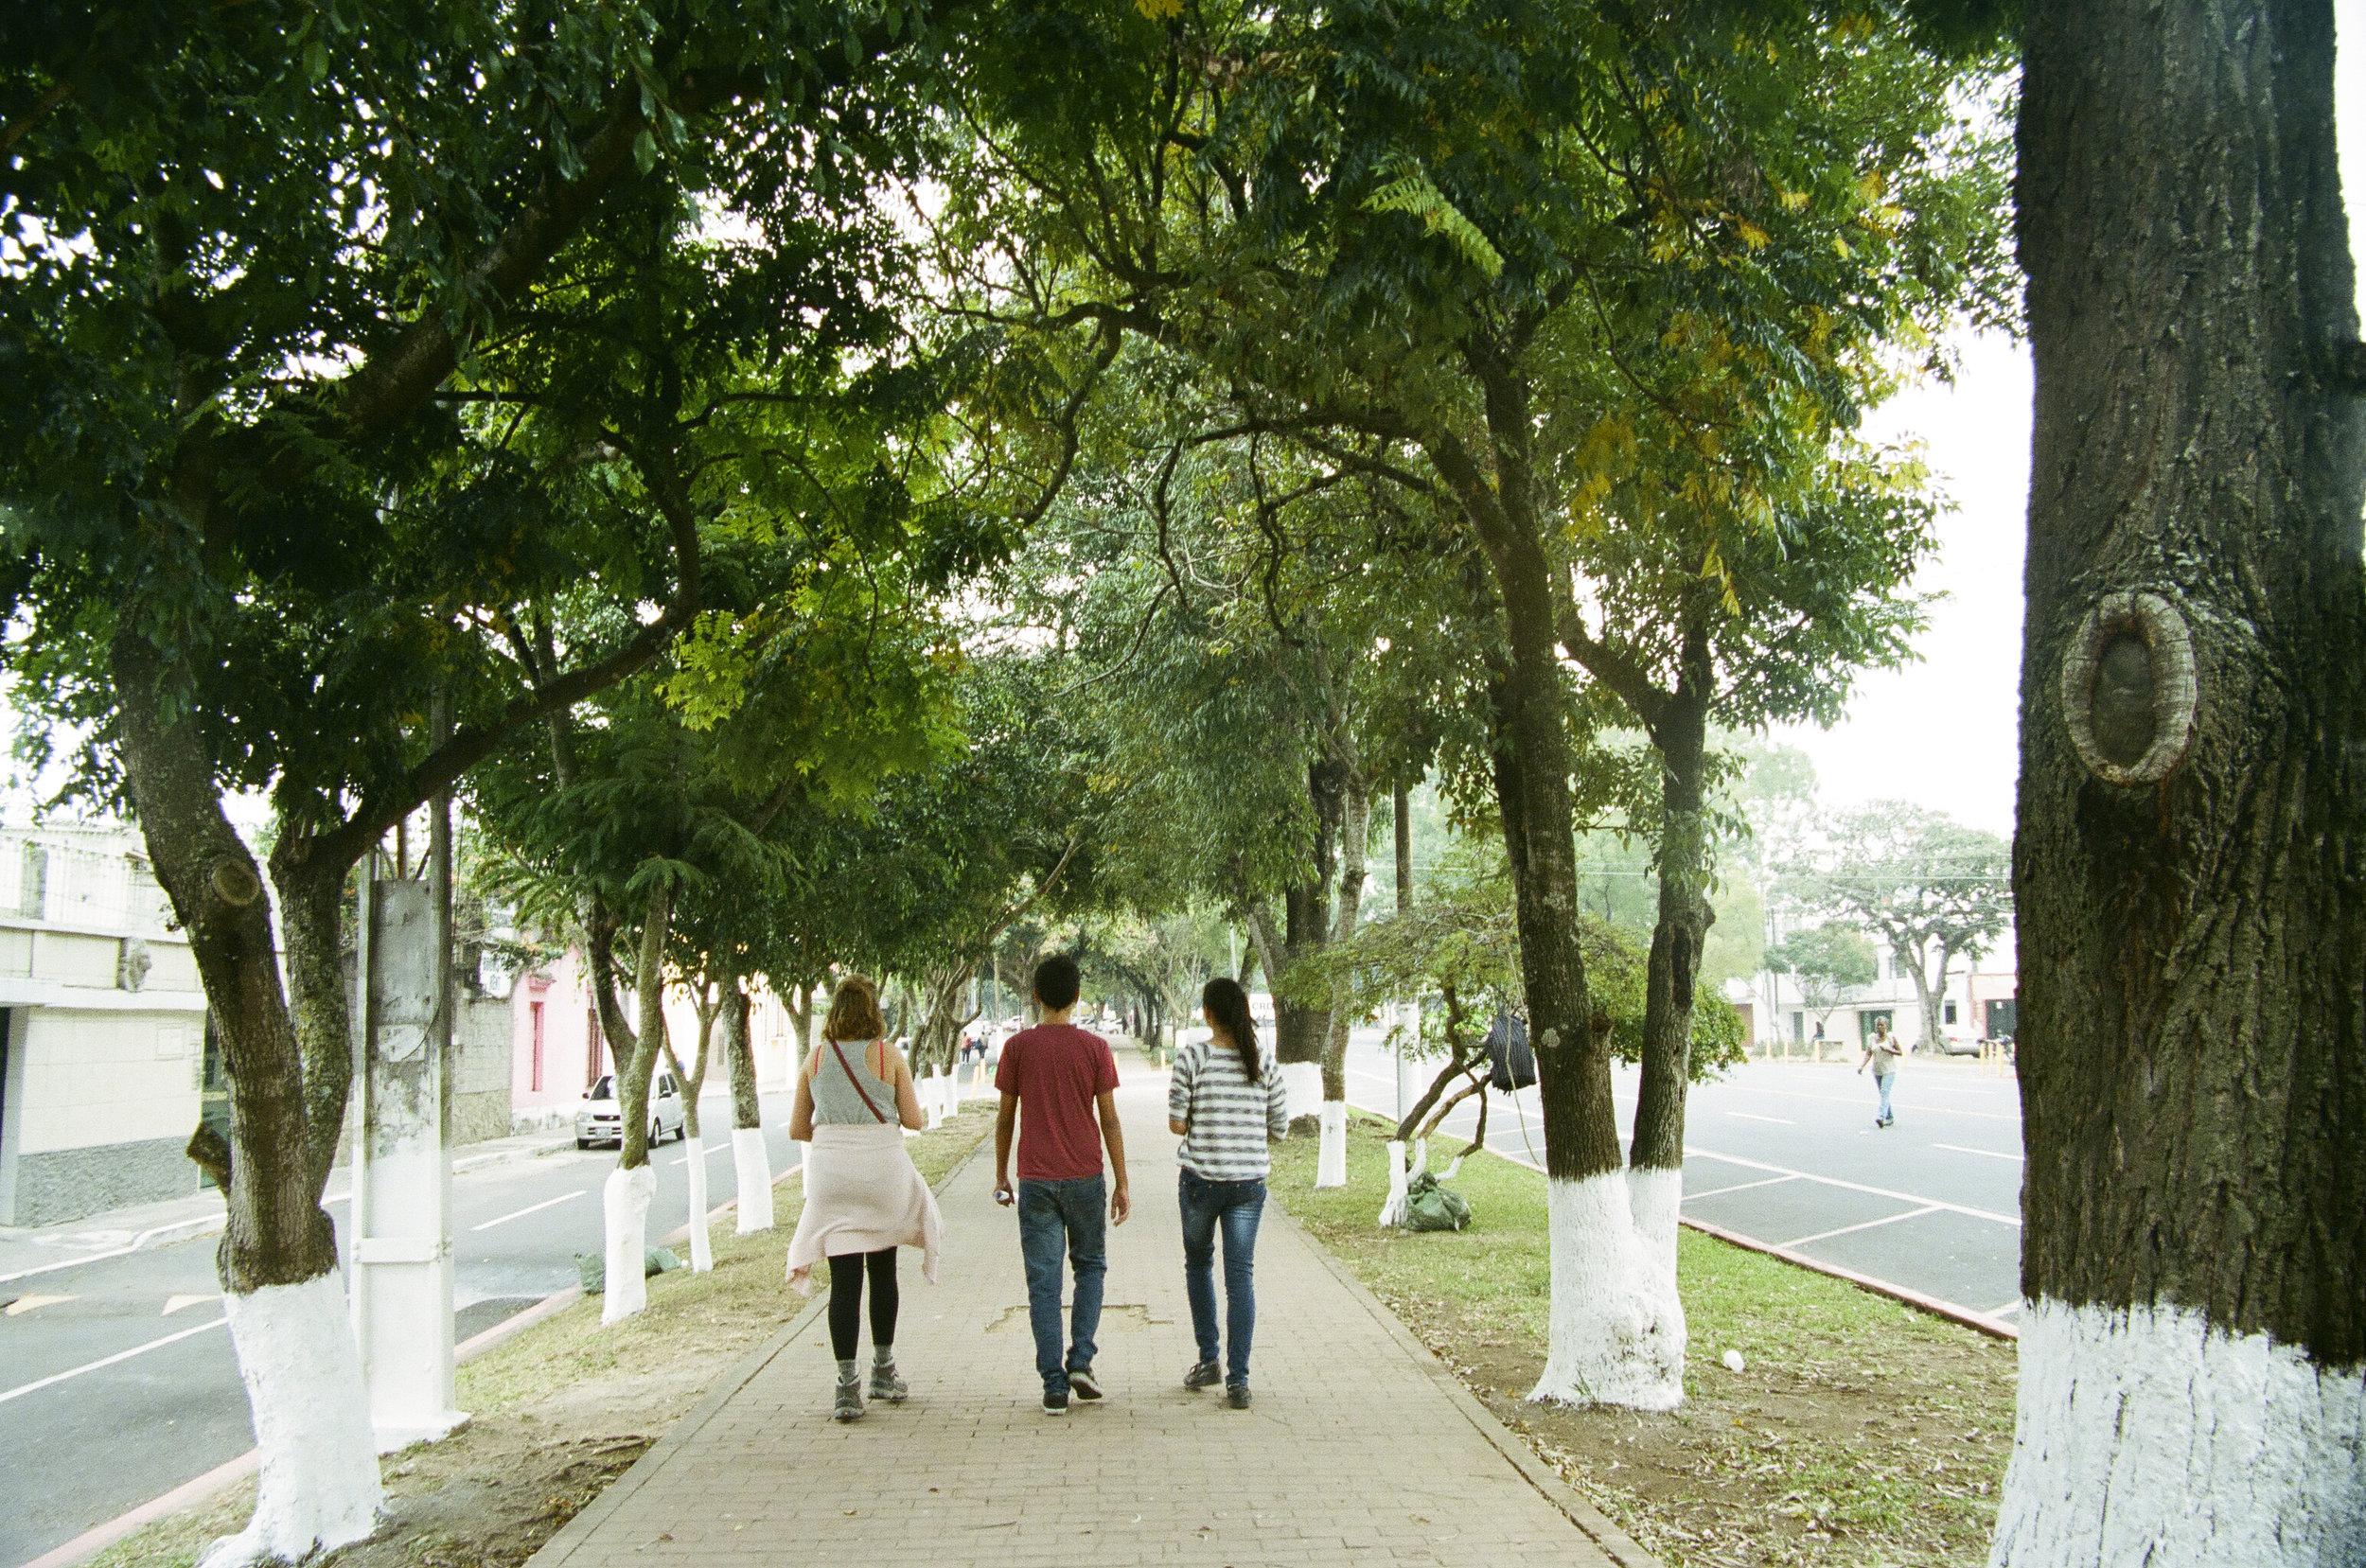 Guatemala_1_30.jpg